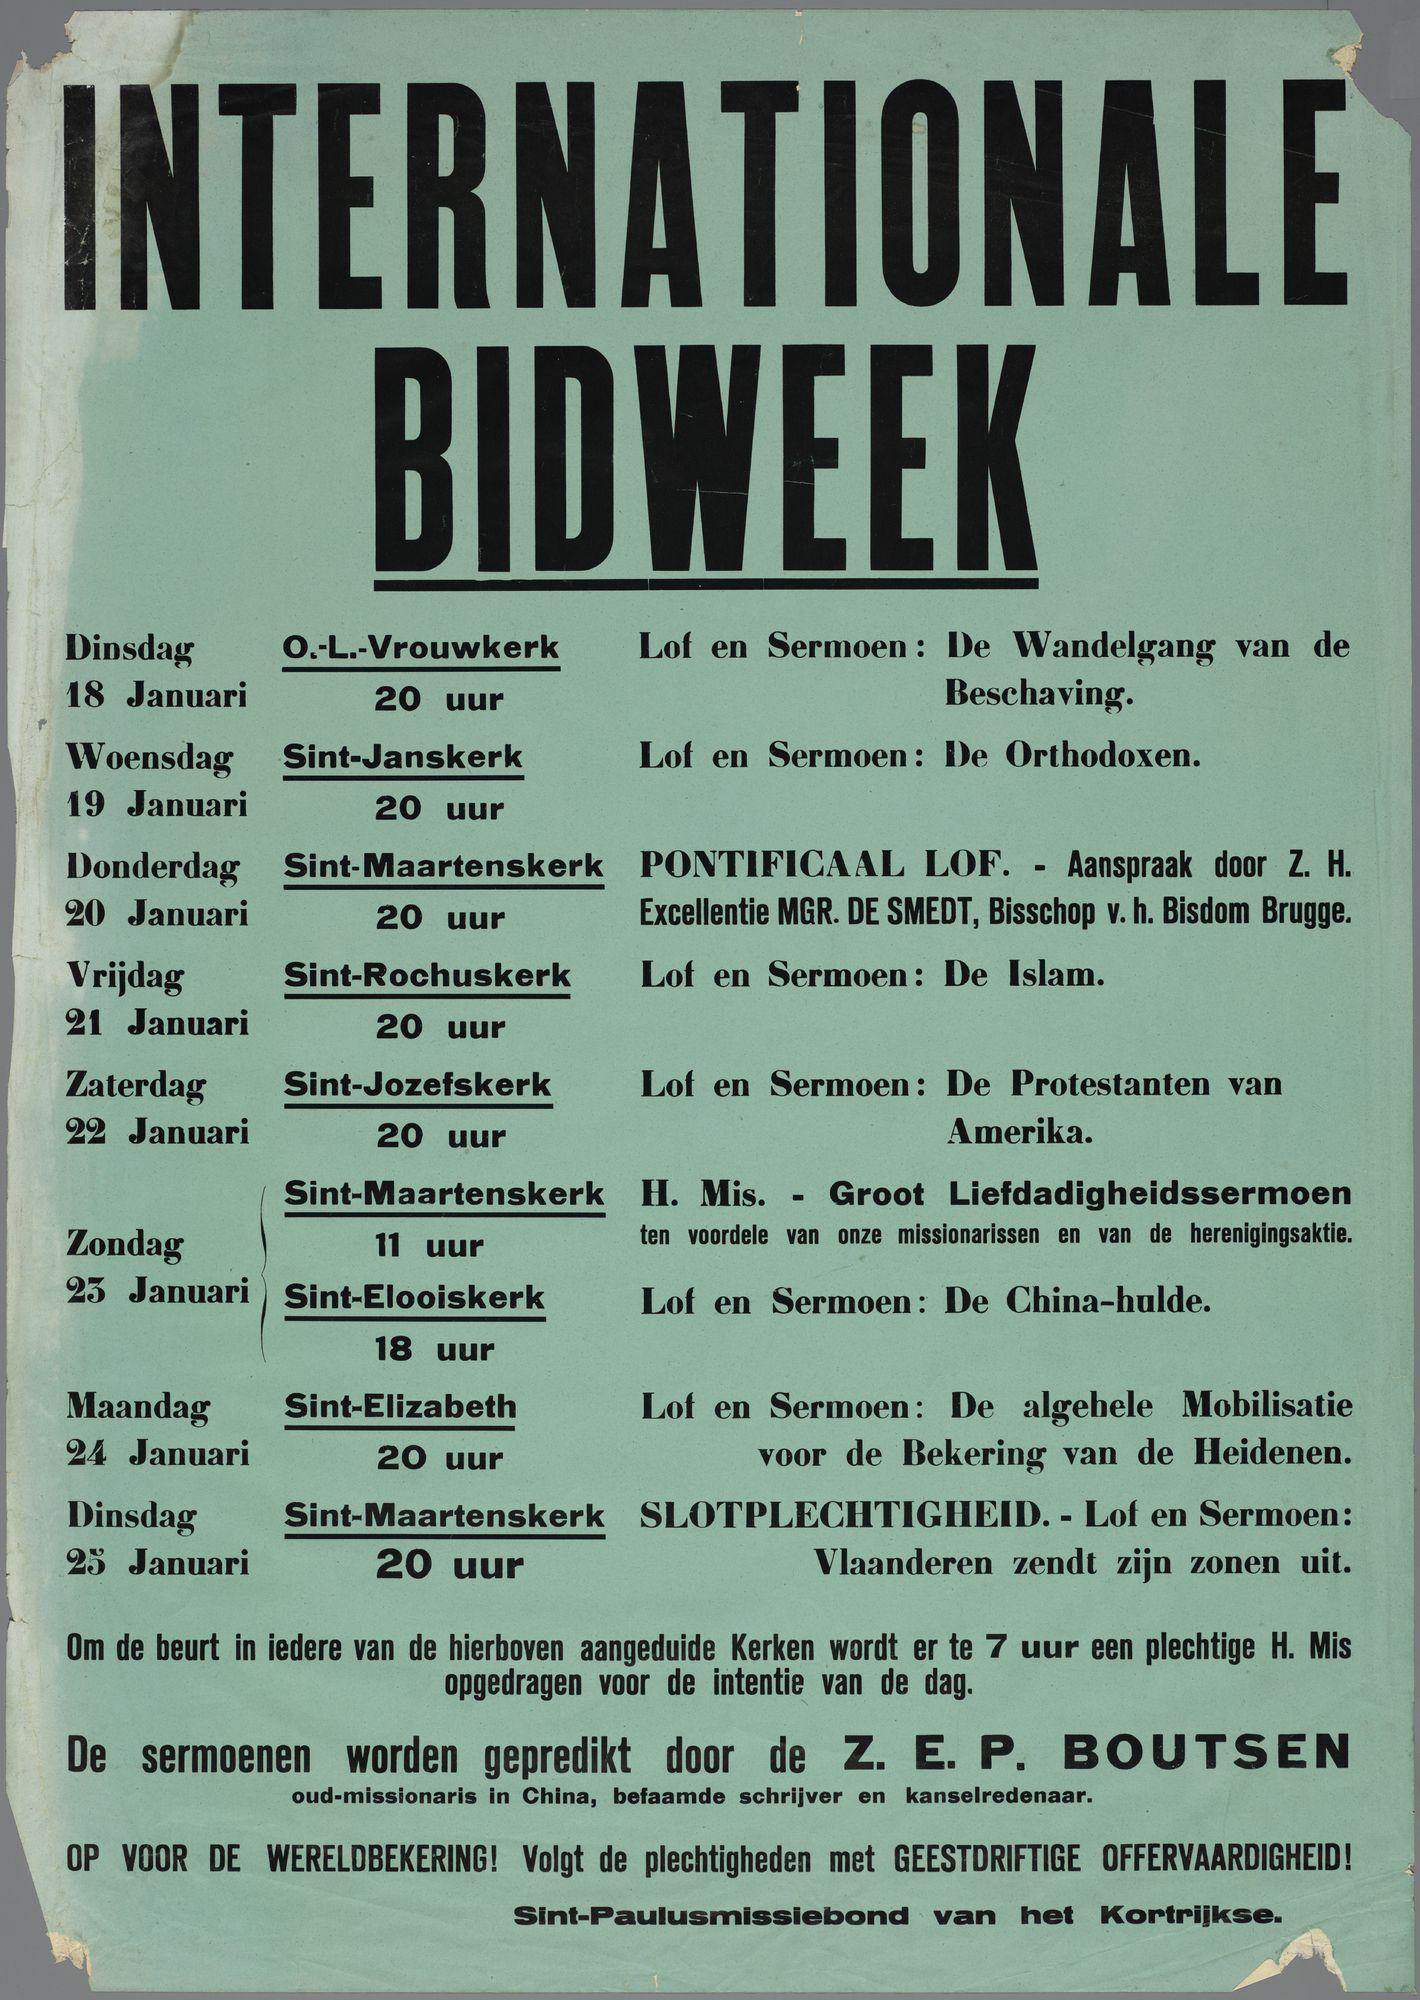 Internationale bidweek